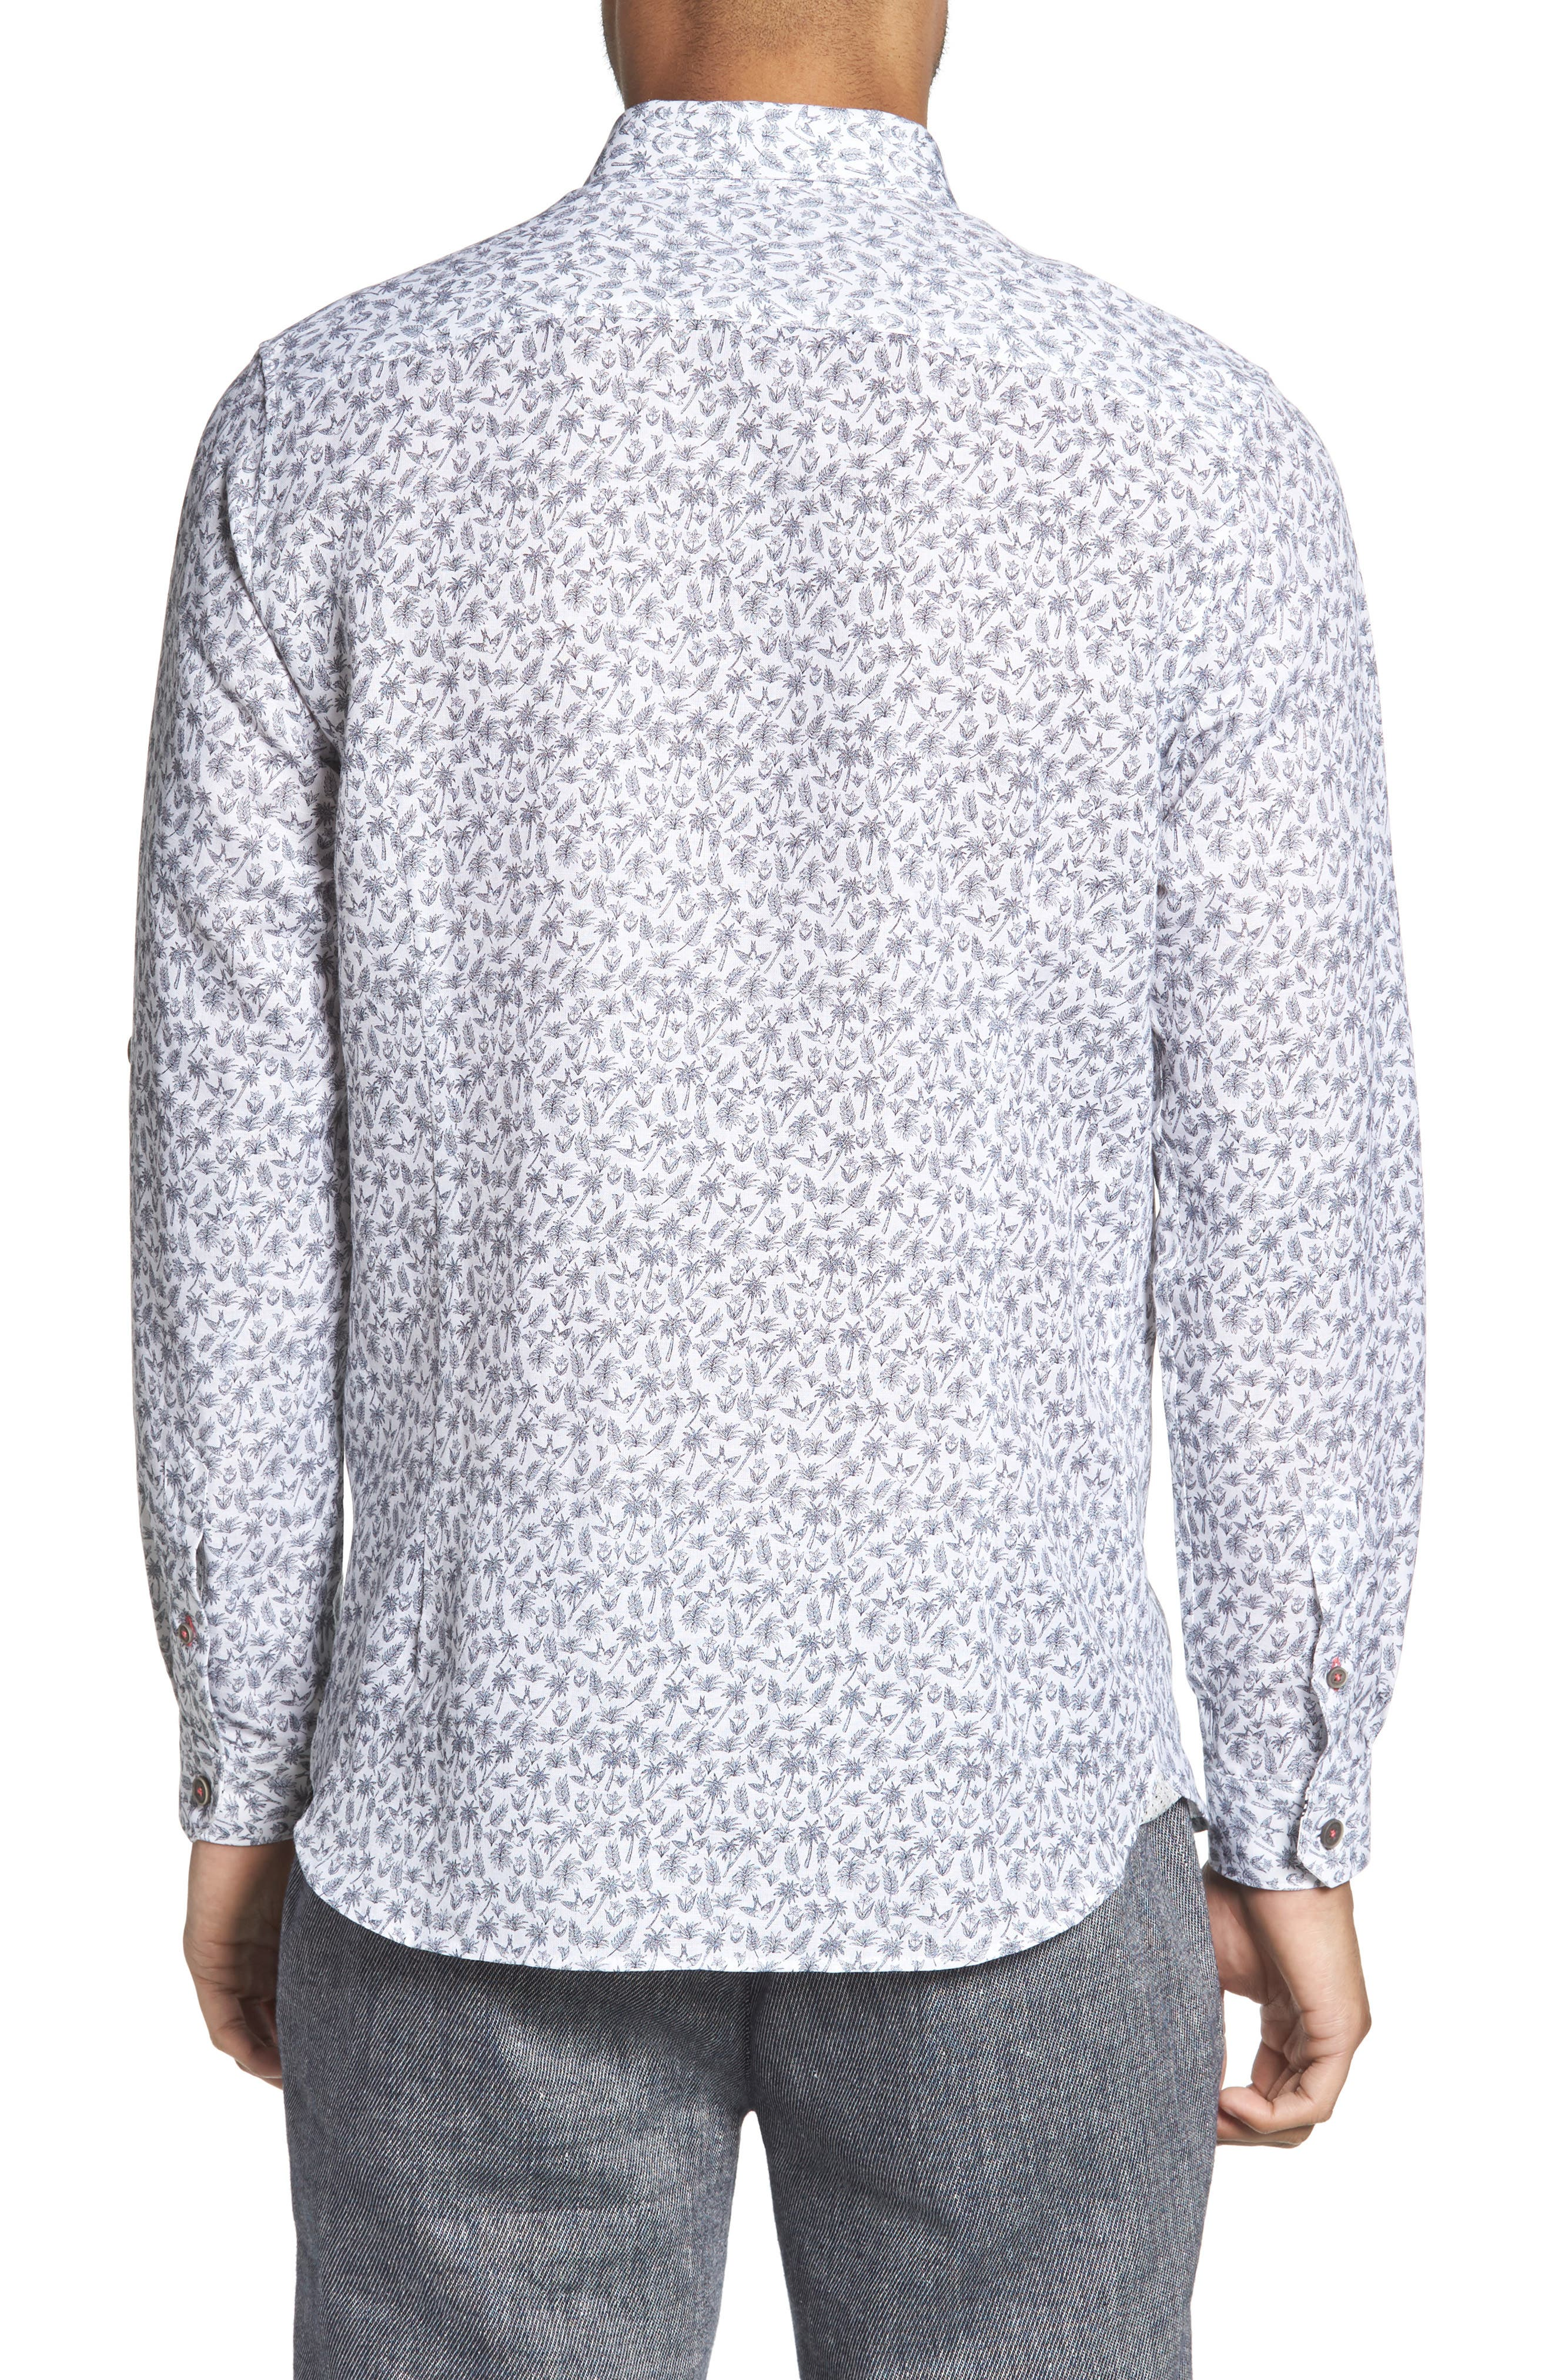 Nazta Trim Fit Tropical Print Sport Shirt,                             Alternate thumbnail 3, color,                             White